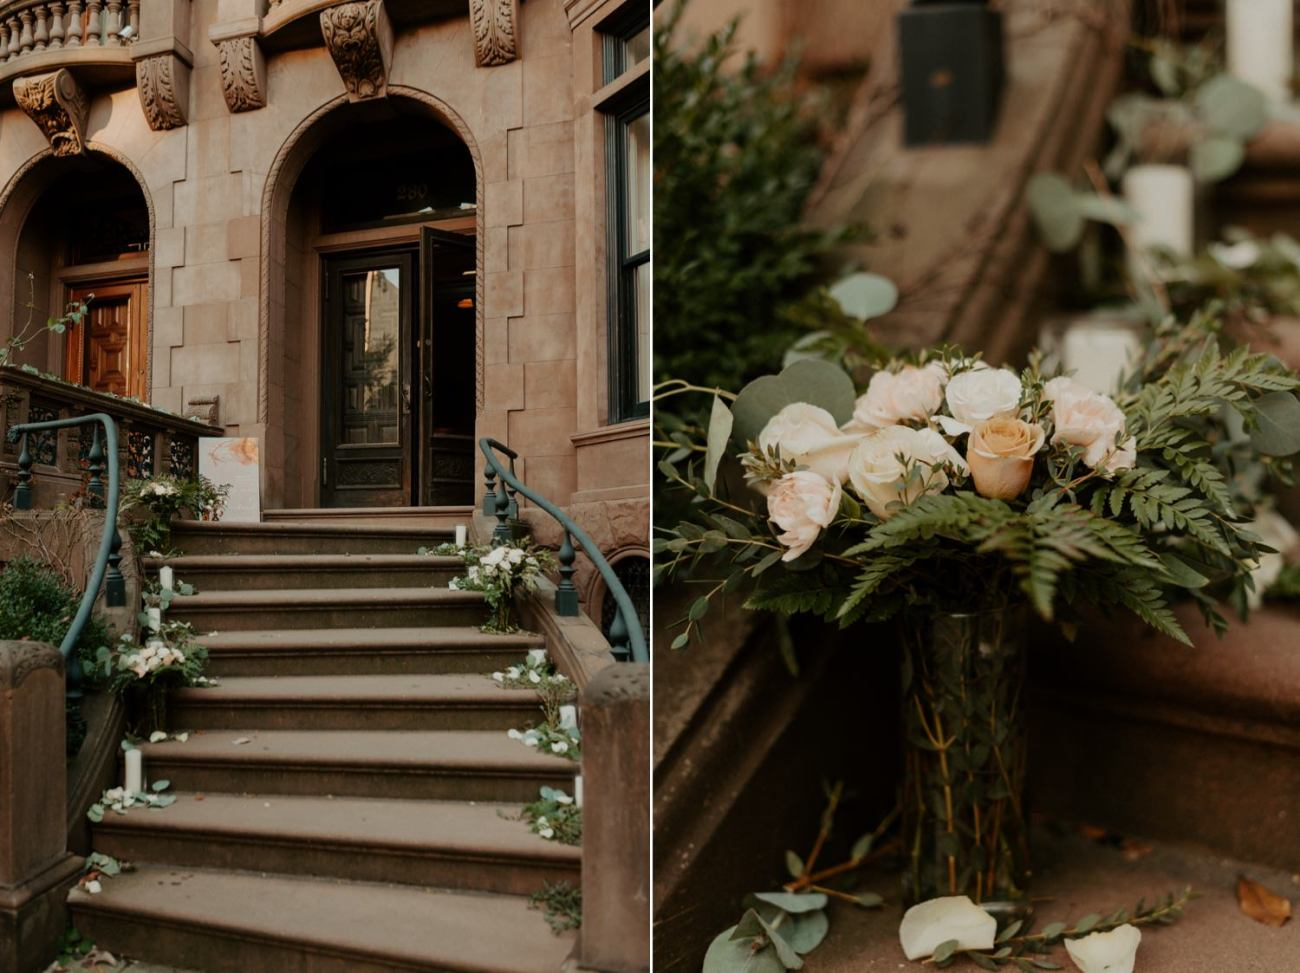 Brooklyn Backyard Wedding In Brownstone House New York City Wedding Photographer Anais Possamai Photography 02